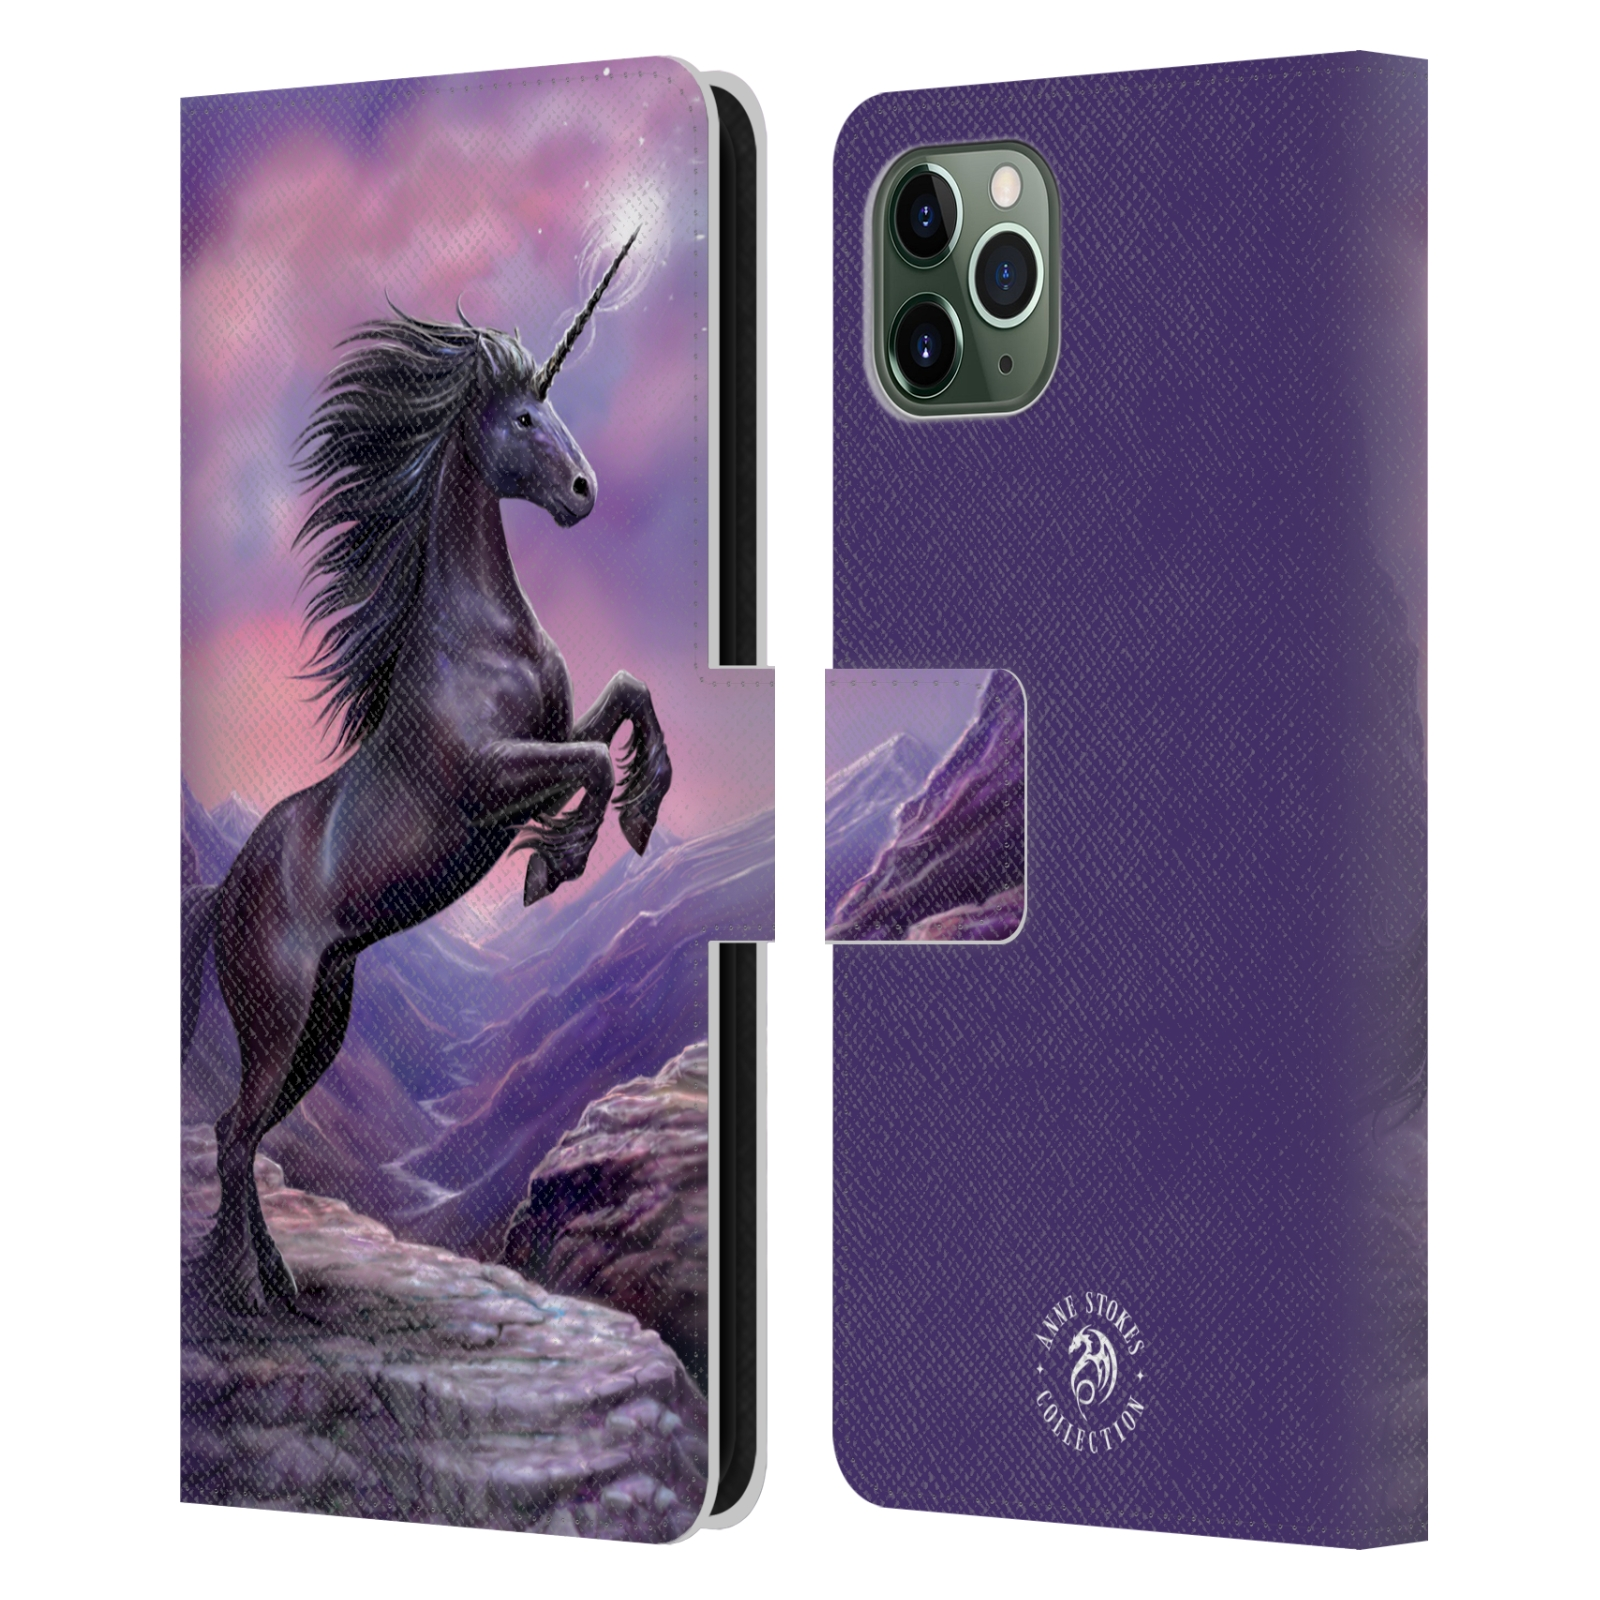 Pouzdro na mobil Apple Iphone 11 PRO MAX - Head Case - fantasy - černý jednorožec